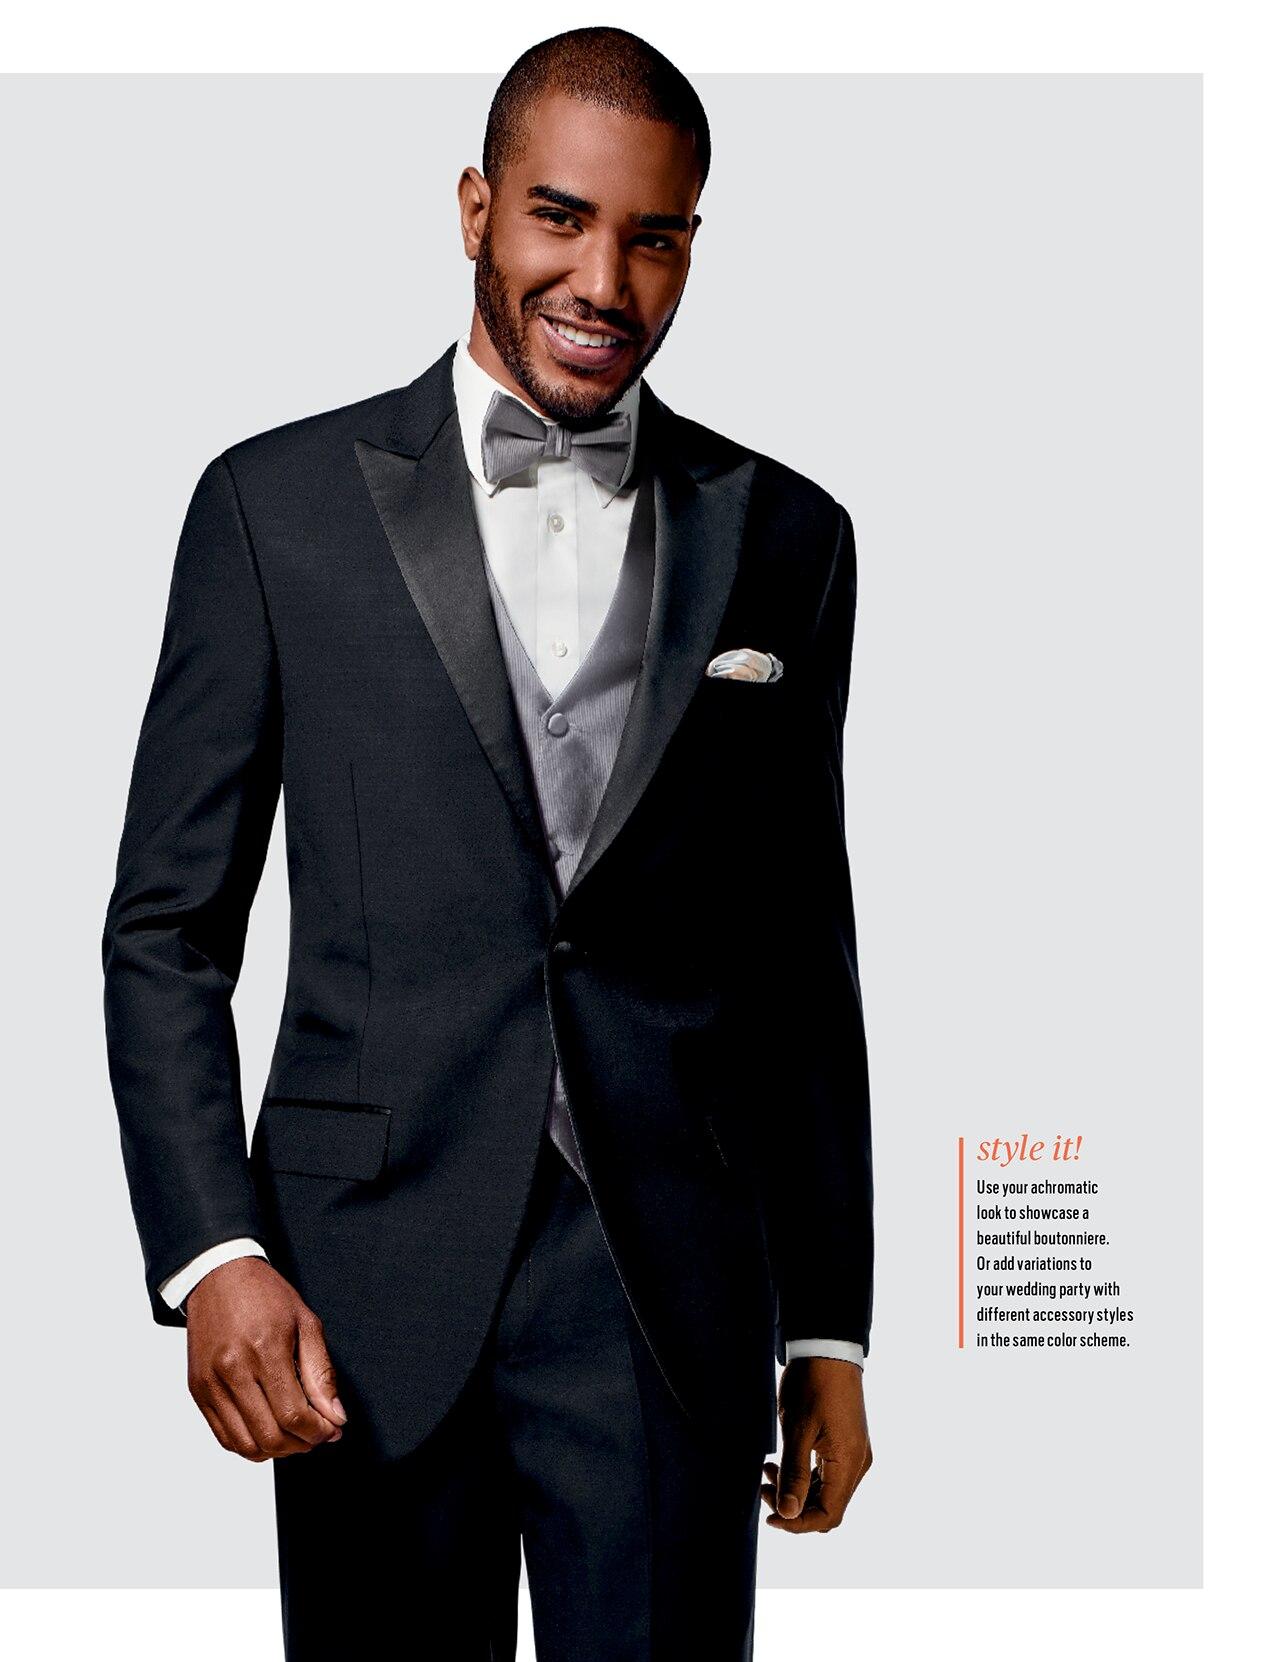 52280715bc Wedding Tuxedo Color Schemes Guide | Tuxedo Rental Men's Wearhouse ...